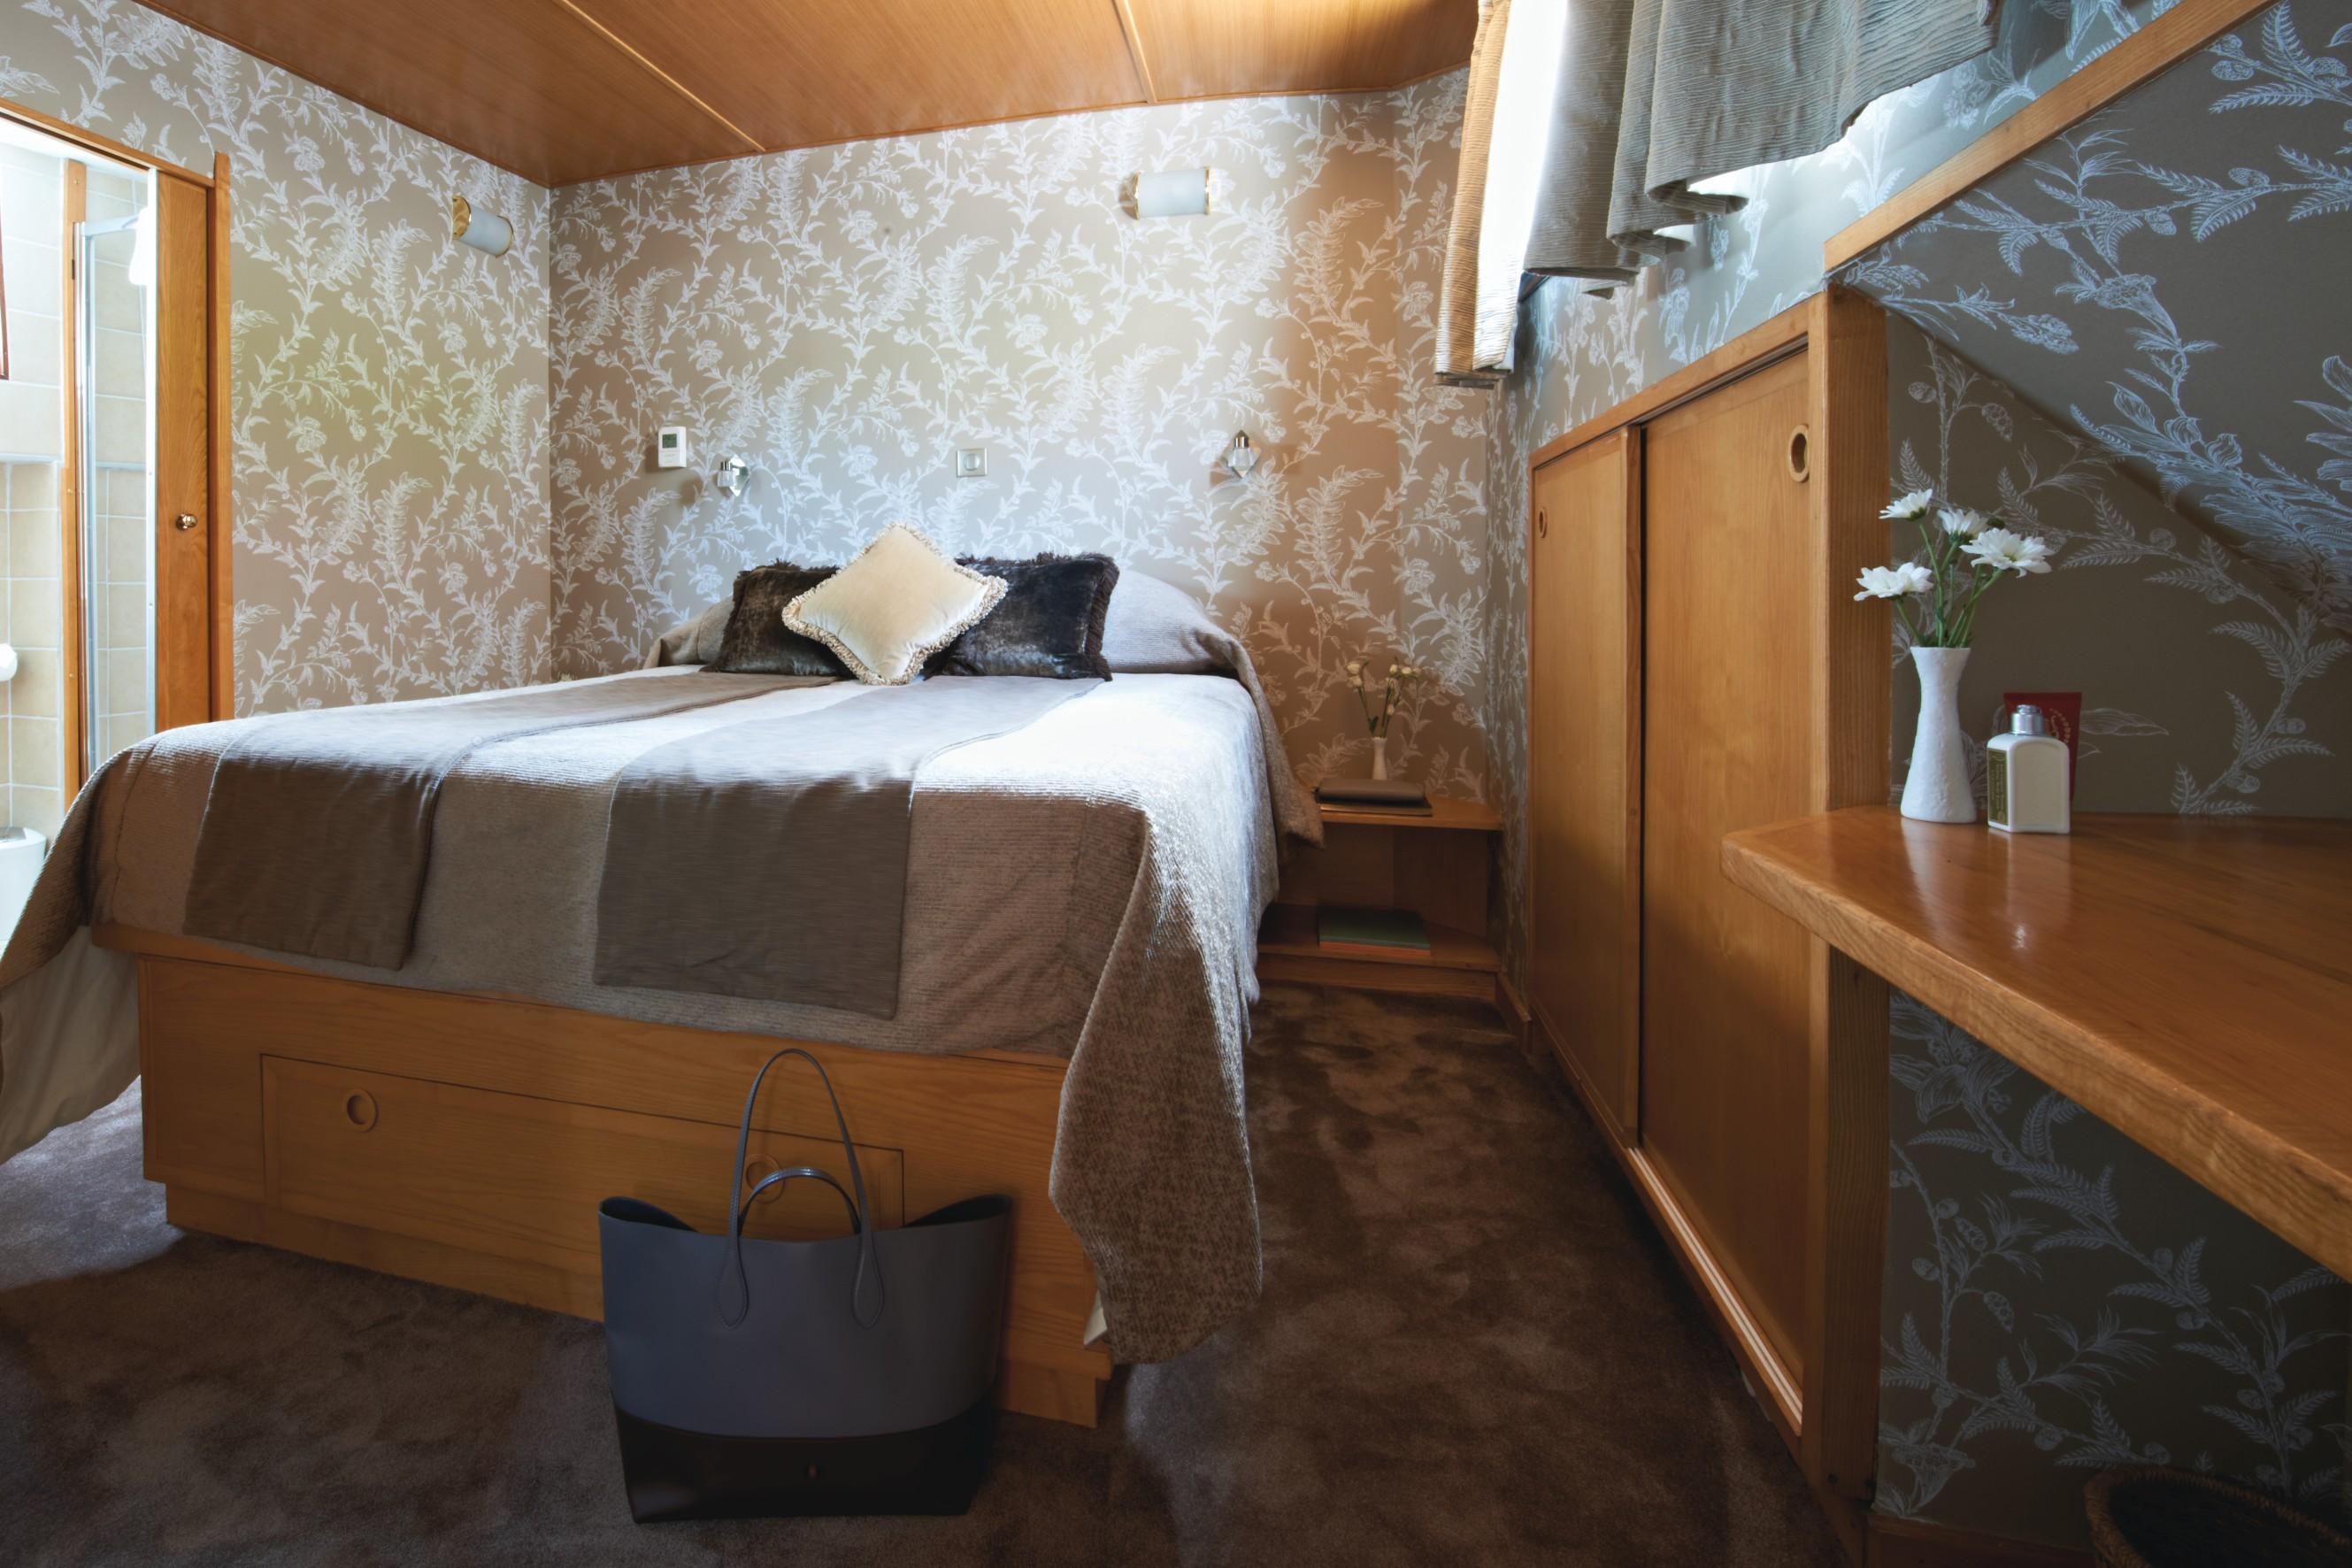 Belmond River Cruises Belmond Hirondelle Accommodation Bedroom 4.jpg